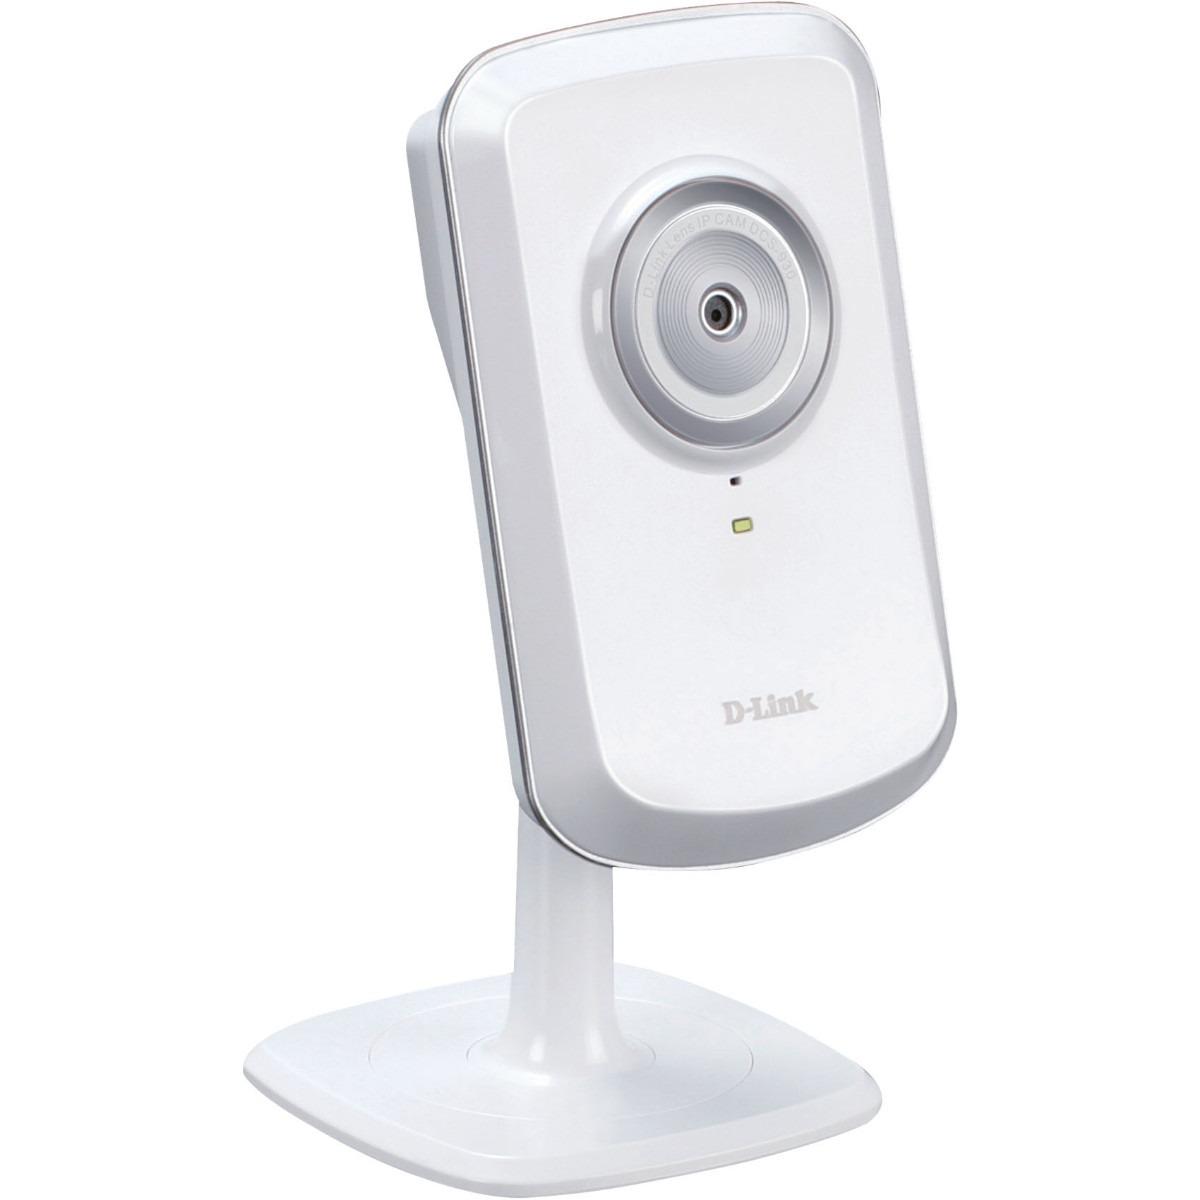 Camara ip de seguridad d link dcs 930l u s 109 99 en - Camara seguridad ip ...